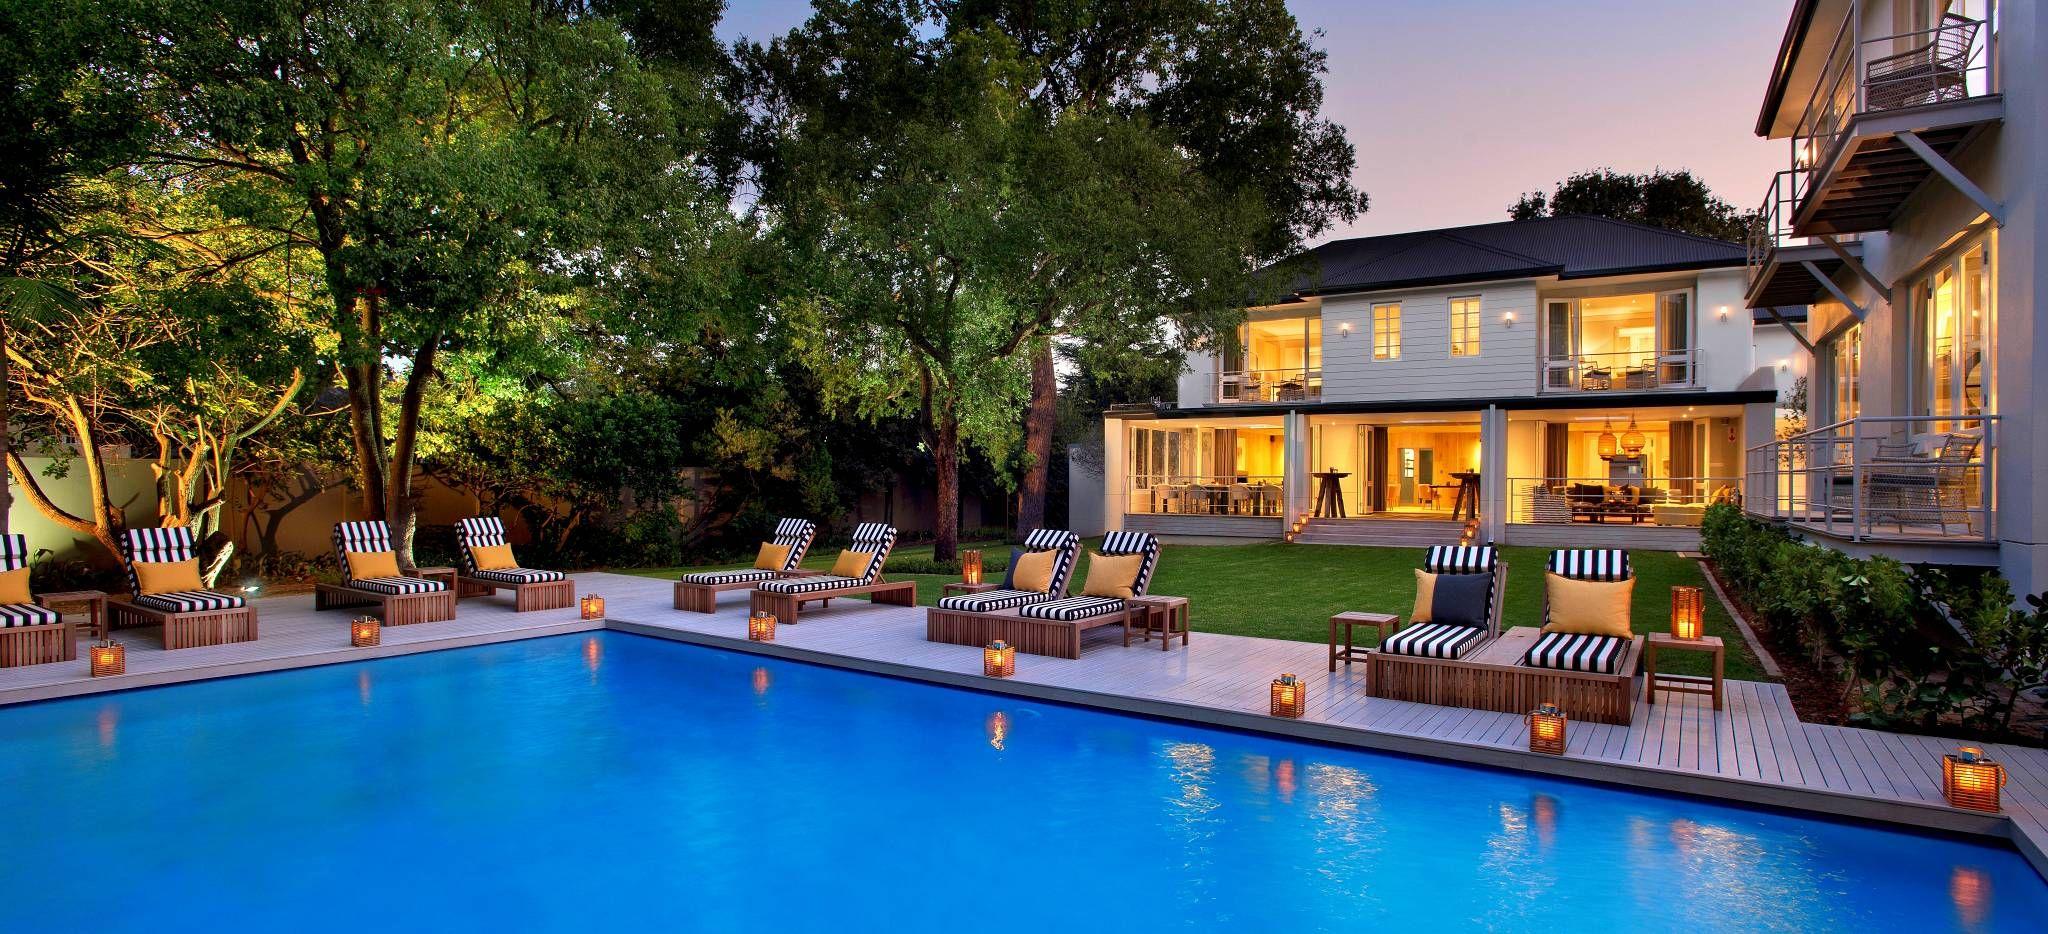 Ein Hotel mit beheiztem Pool, Hotel: Athol Place, Kapstadt, Südafrika